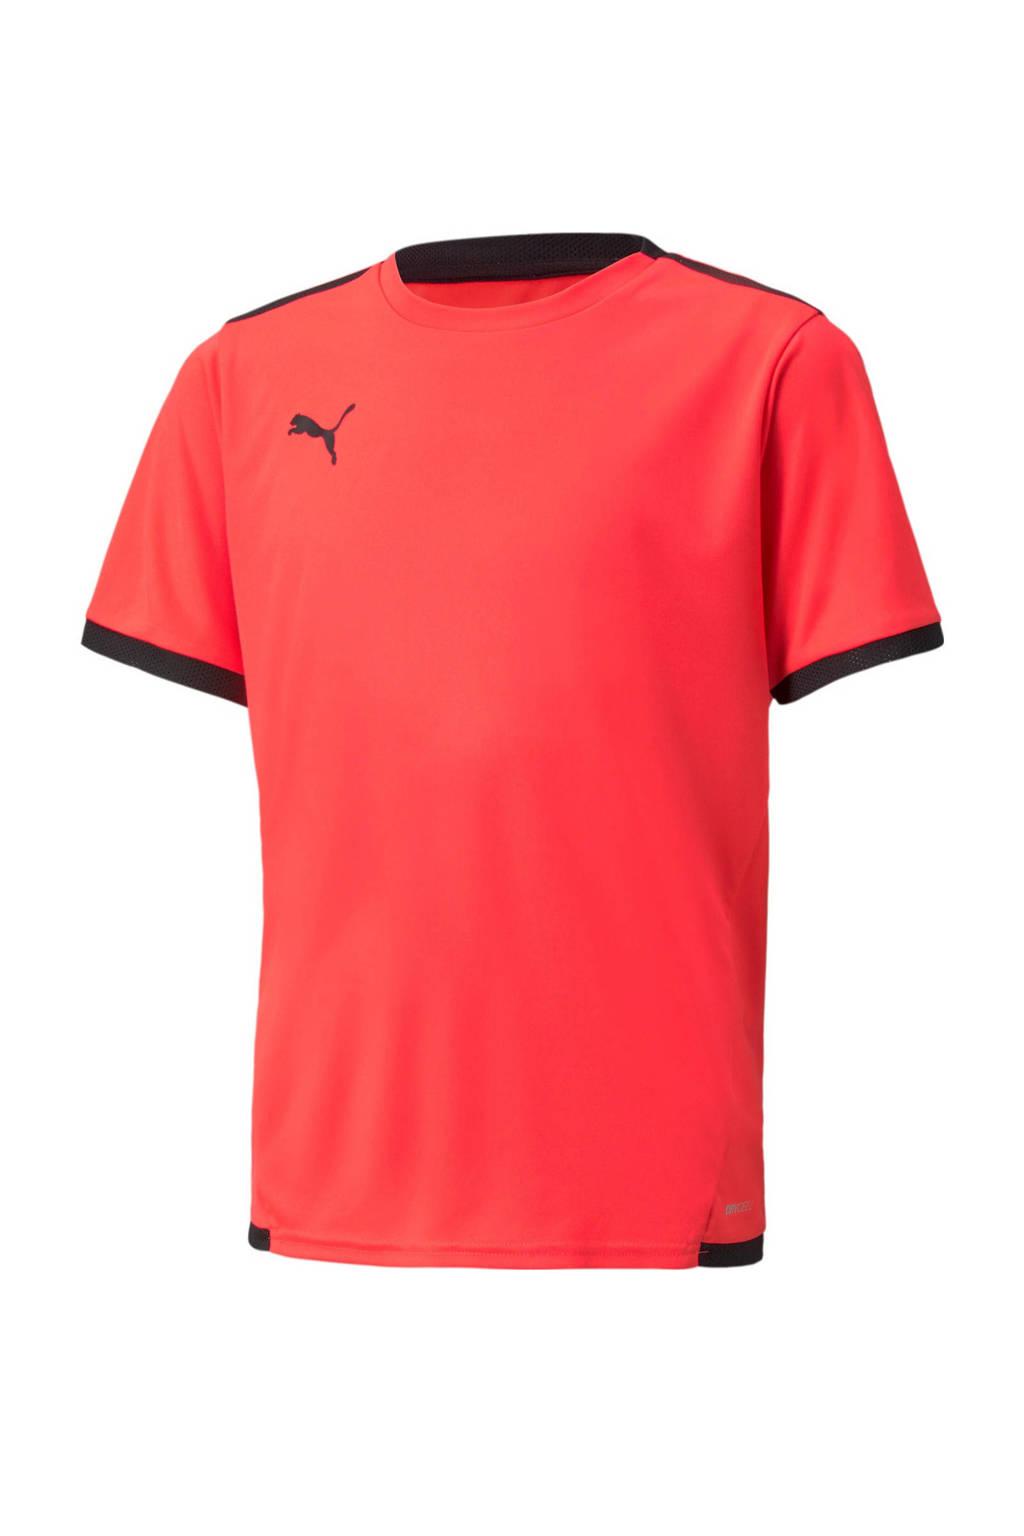 Puma Junior  voetbalshirt rood/zwart, Rood/zwart